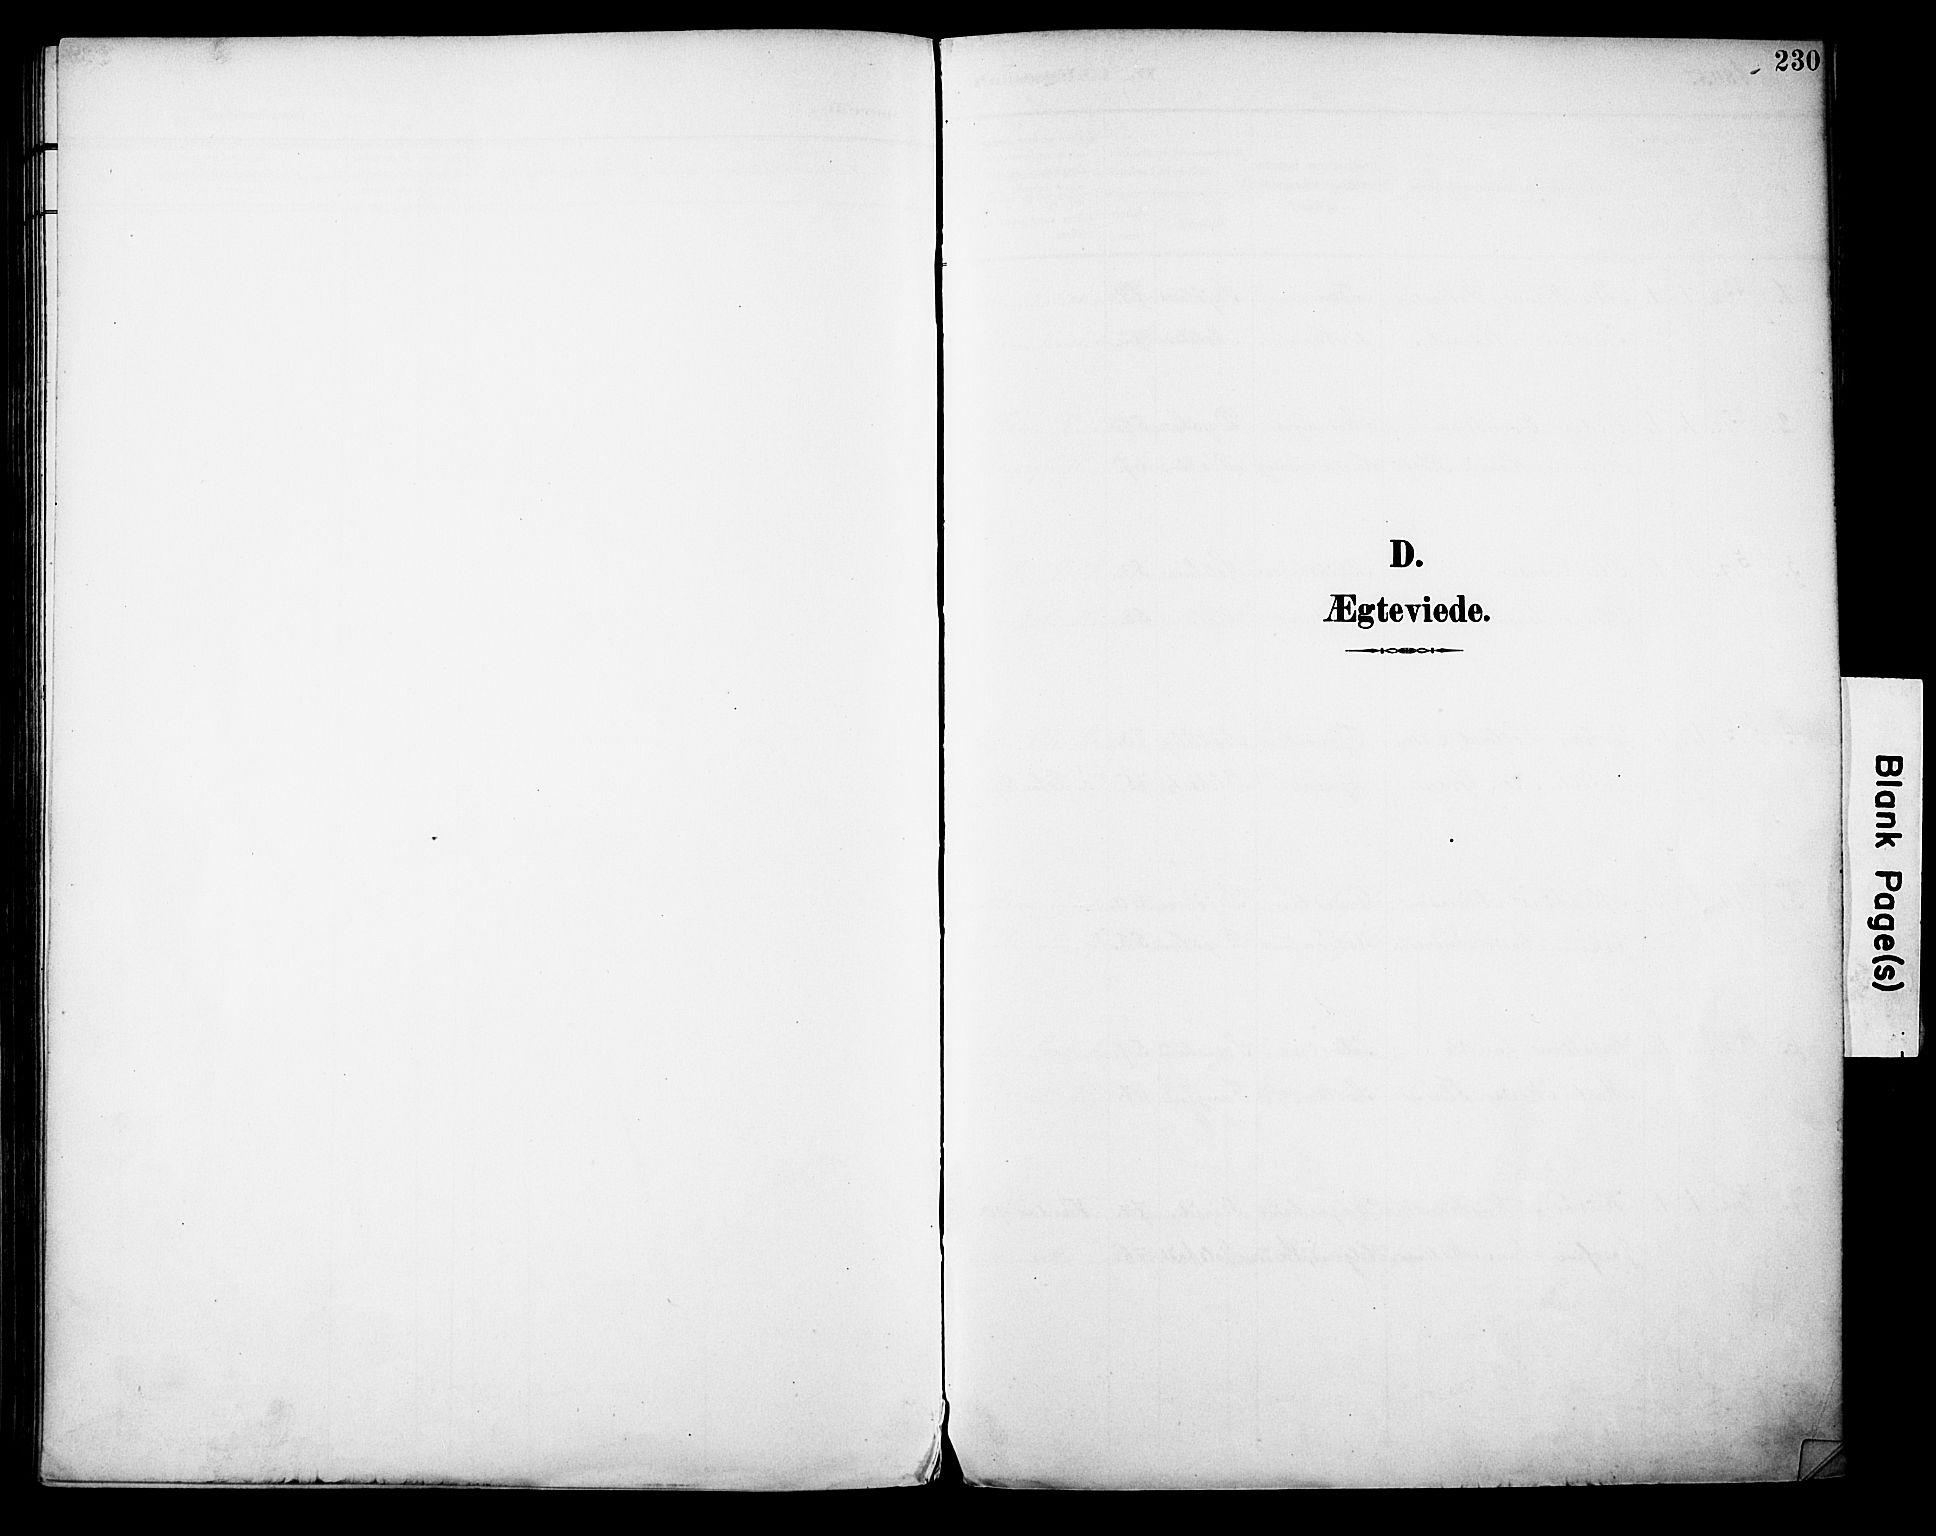 SAH, Vestre Toten prestekontor, H/Ha/Haa/L0013: Parish register (official) no. 13, 1895-1911, p. 230